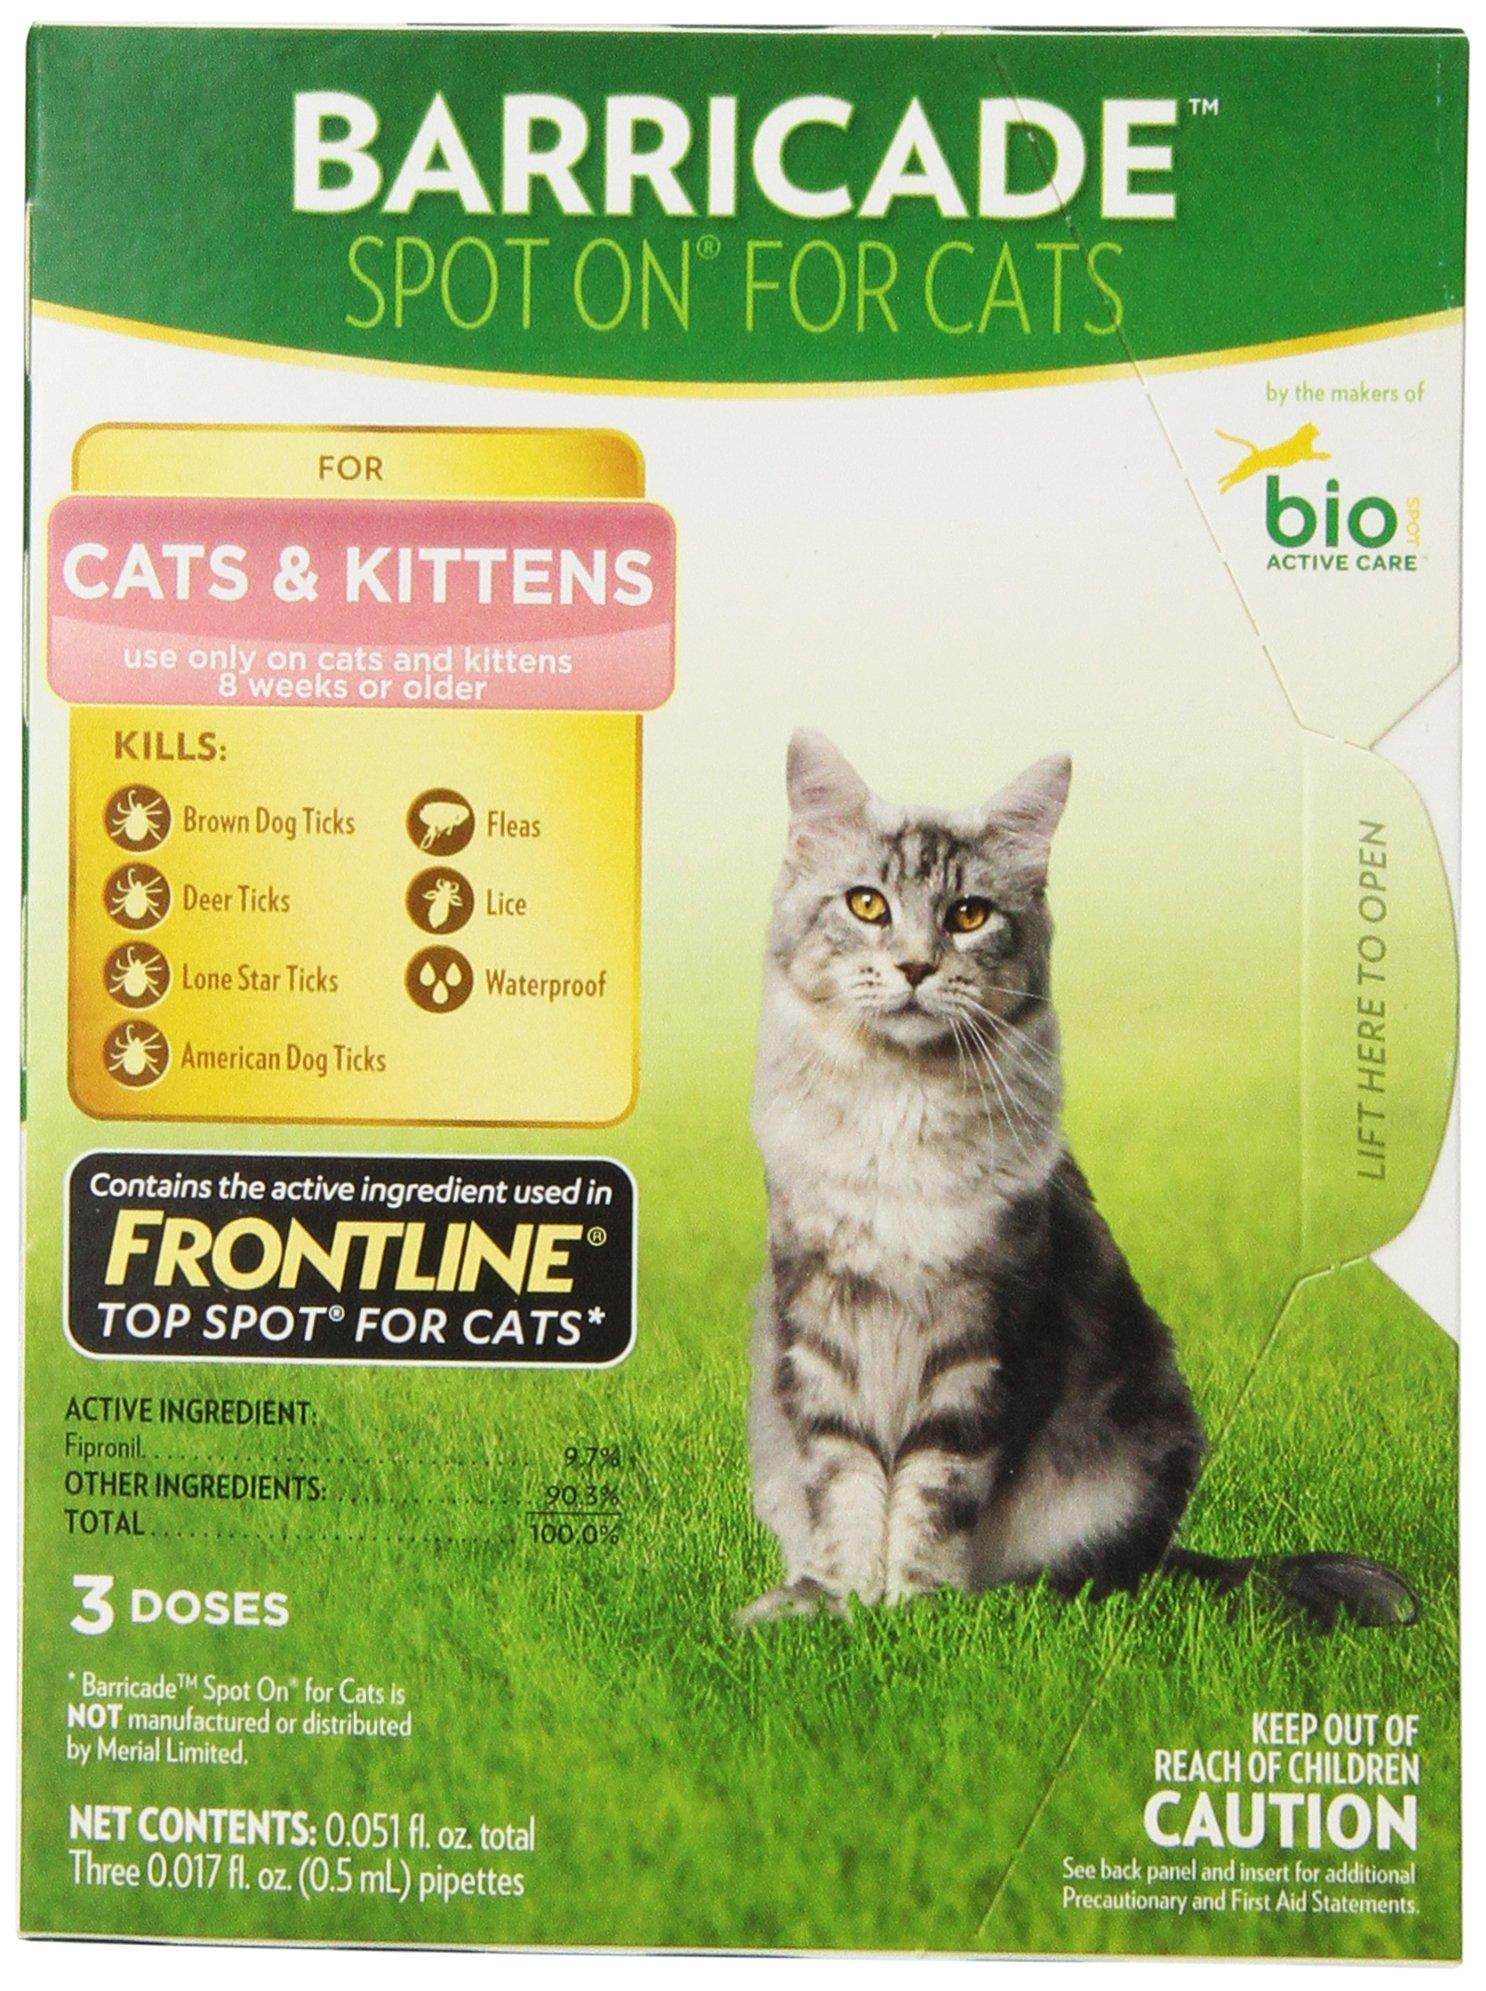 Barricade Spot-On Flea Drops for Cats